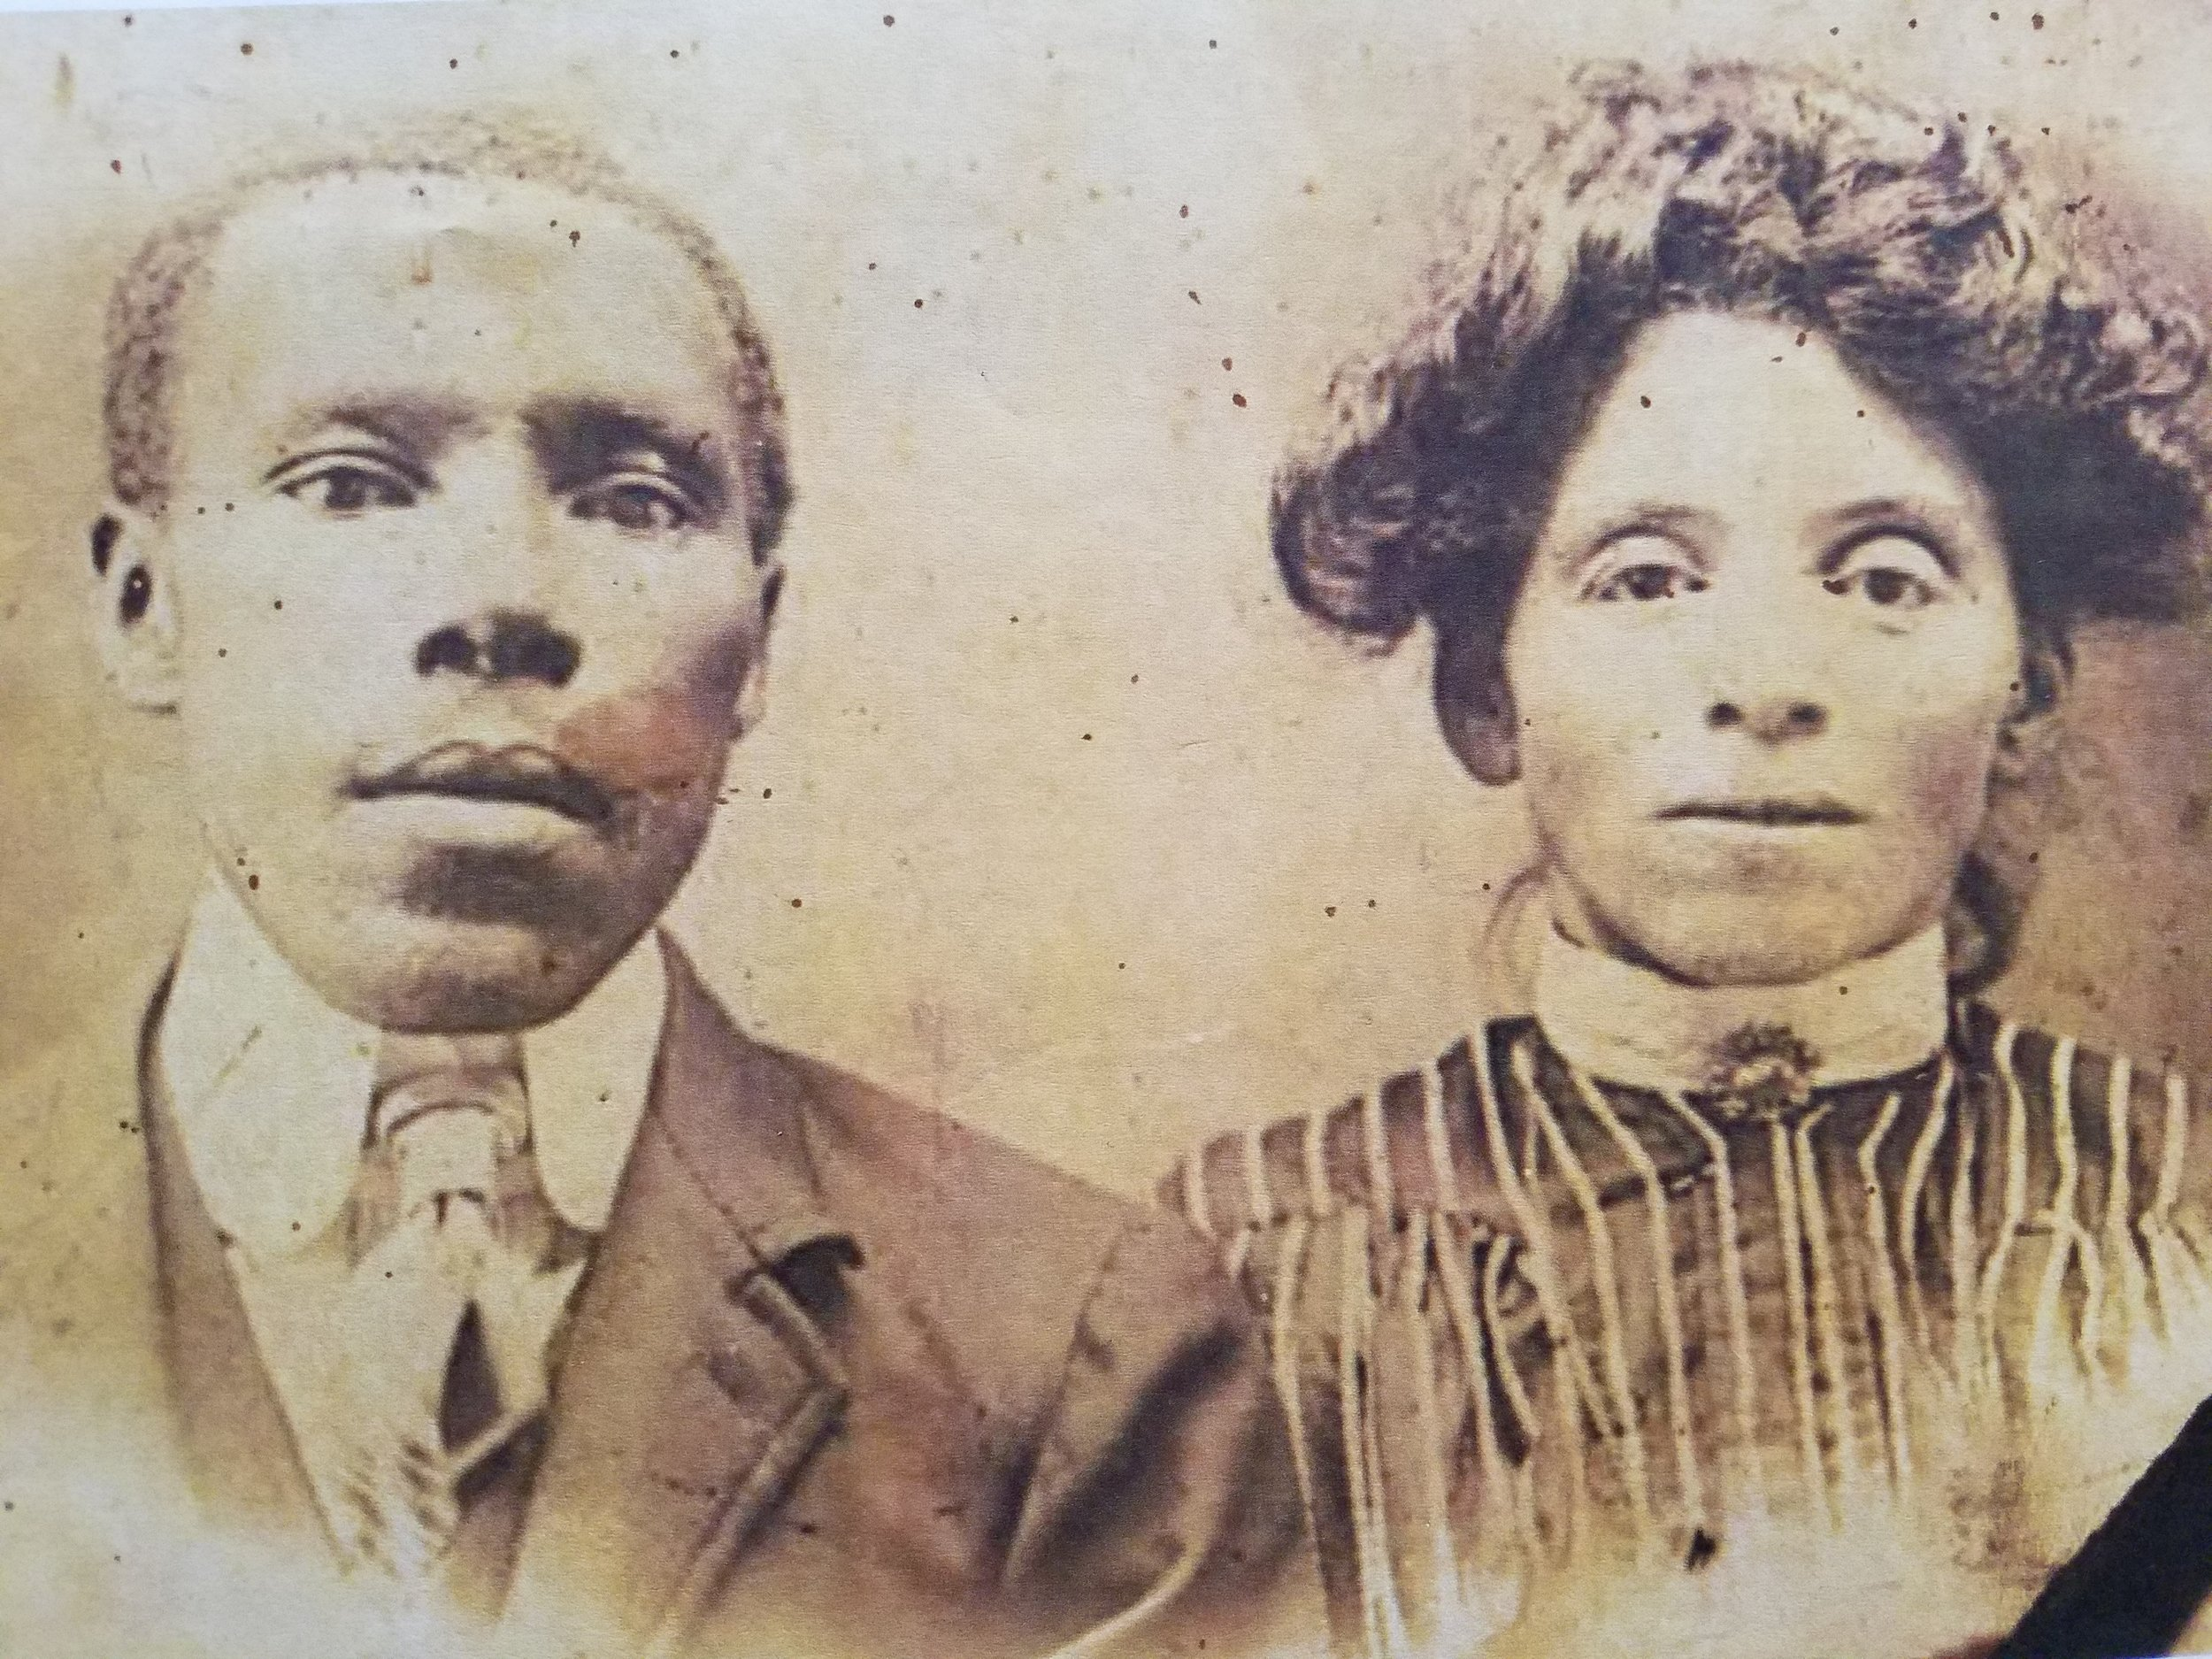 Willisville residents Adolphus Hampton (1860-1912) and his wife Mary Florence Jackson Hampton (1869-1929)